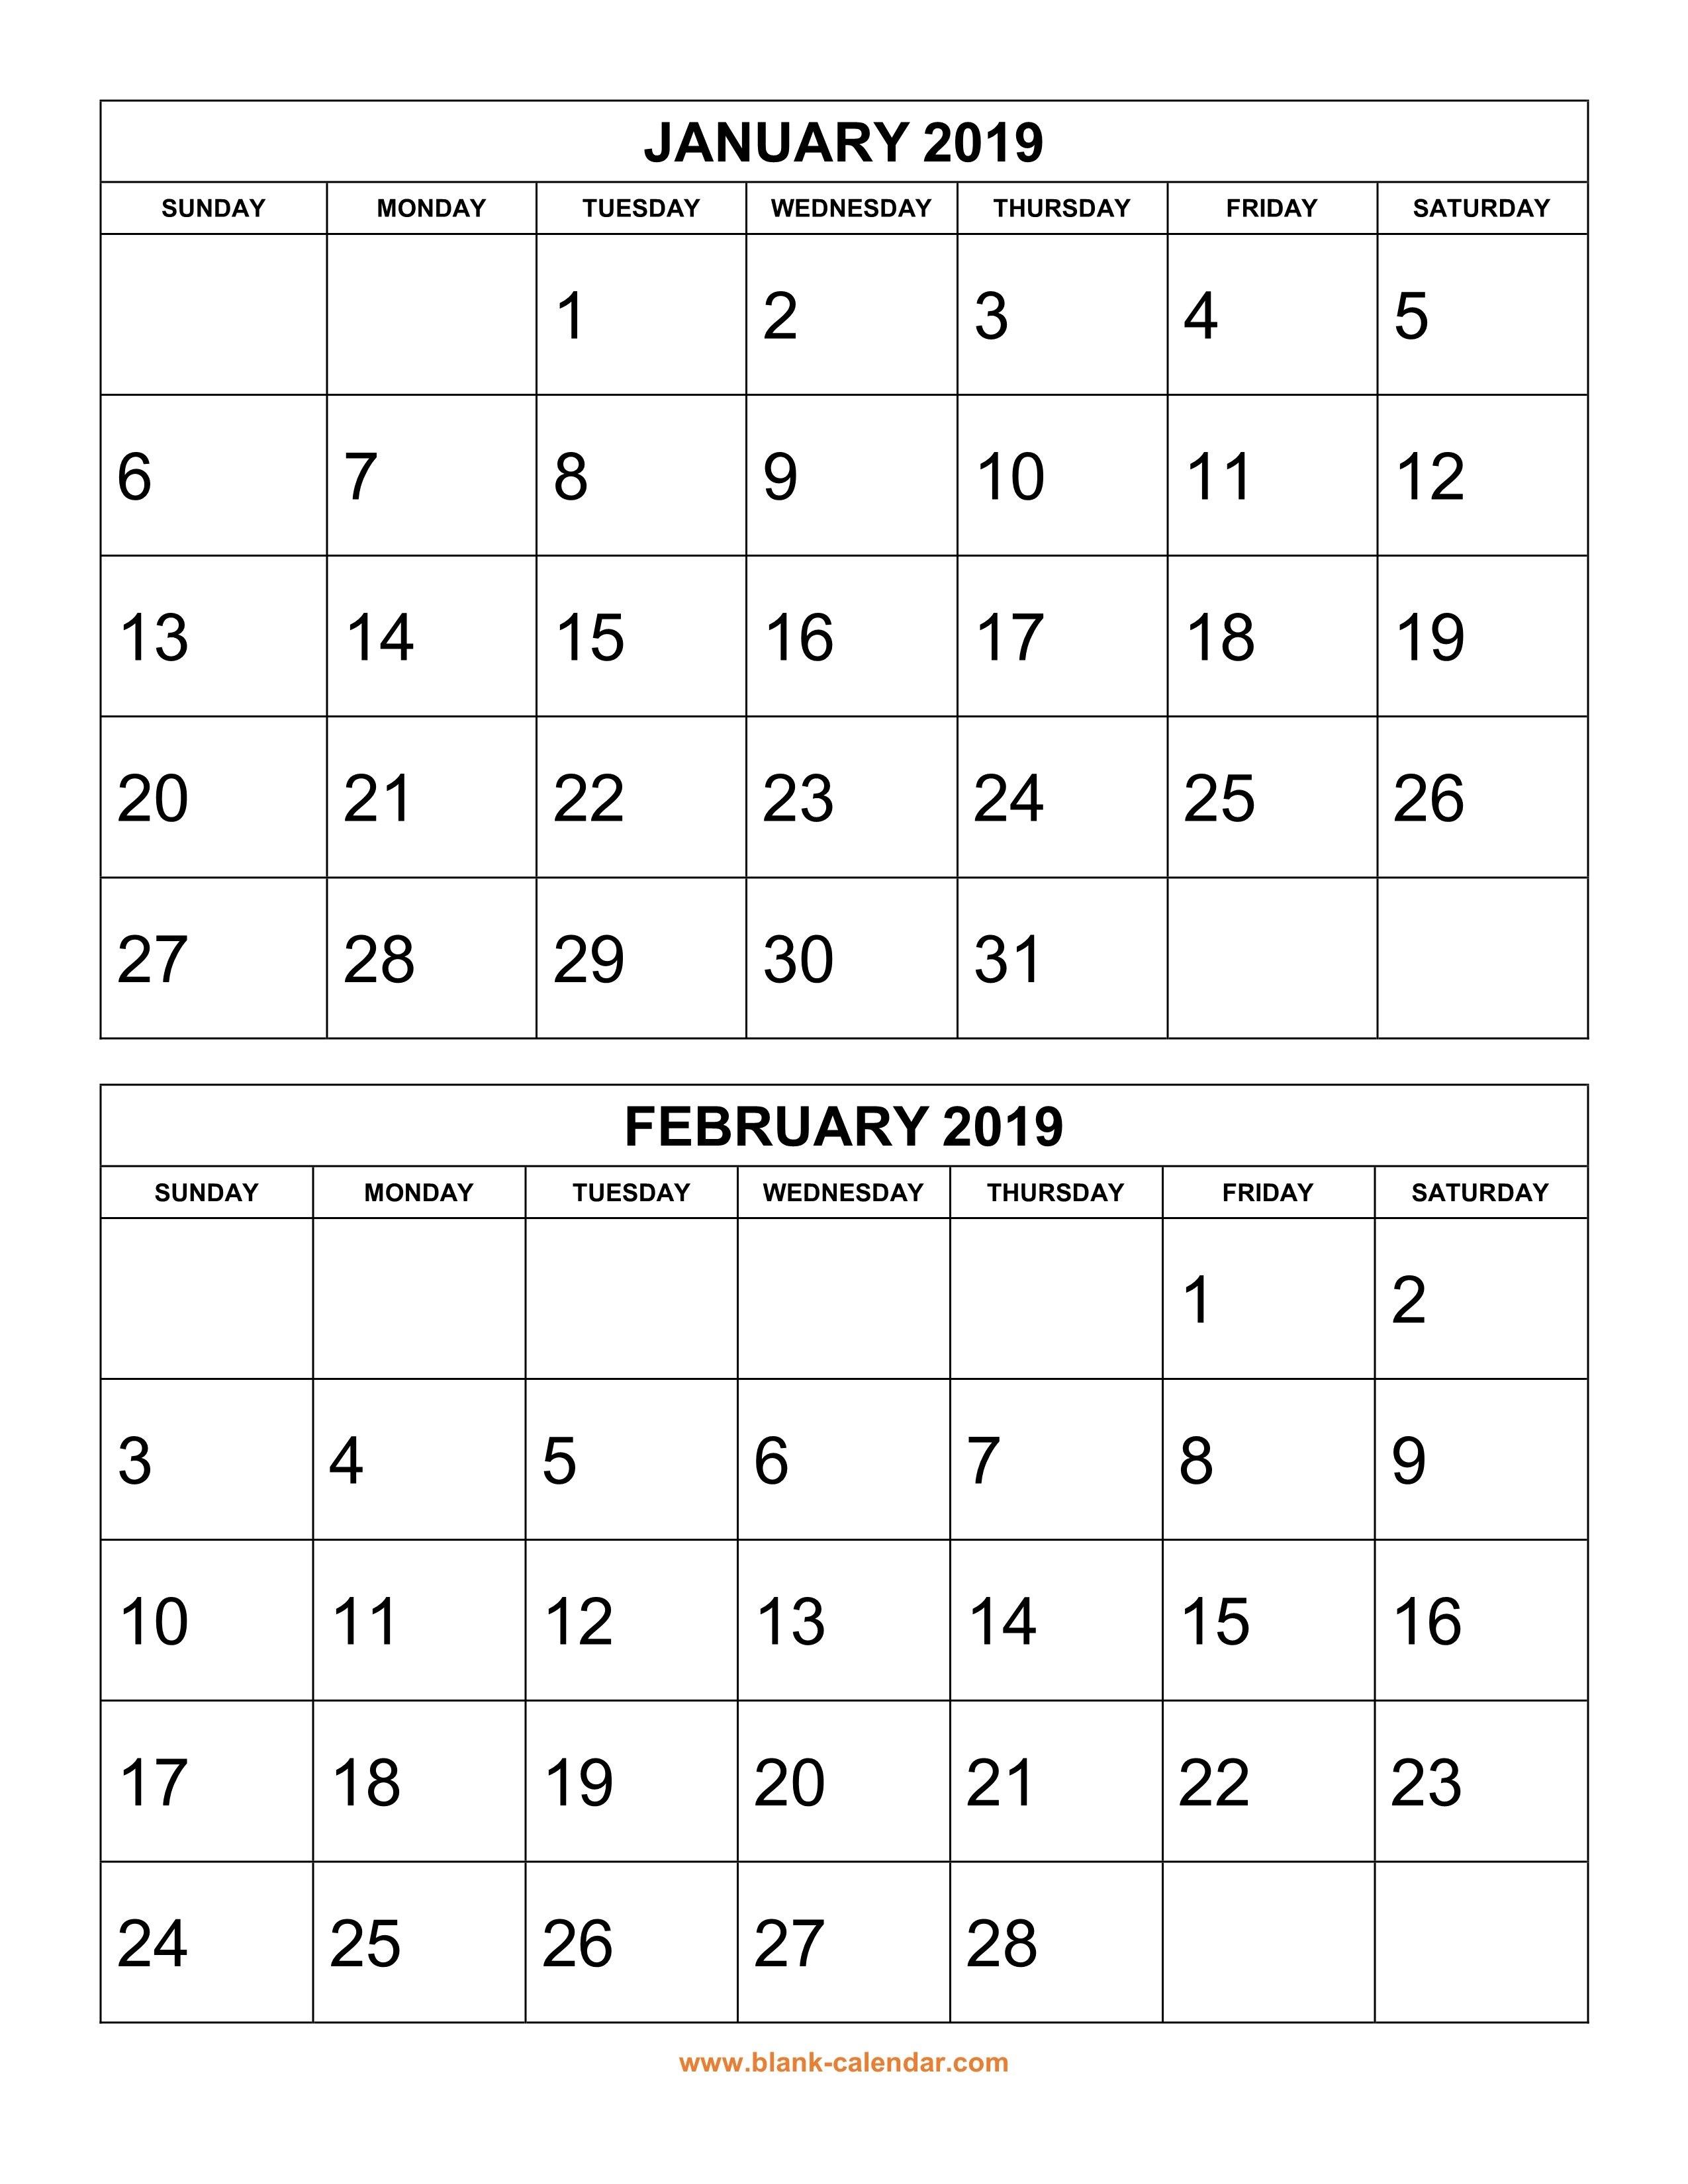 Free Download Printable Calendar 2019, 2 Months Per Page, 6 Pages 2 Page Monthly Calendar 2019 Printable